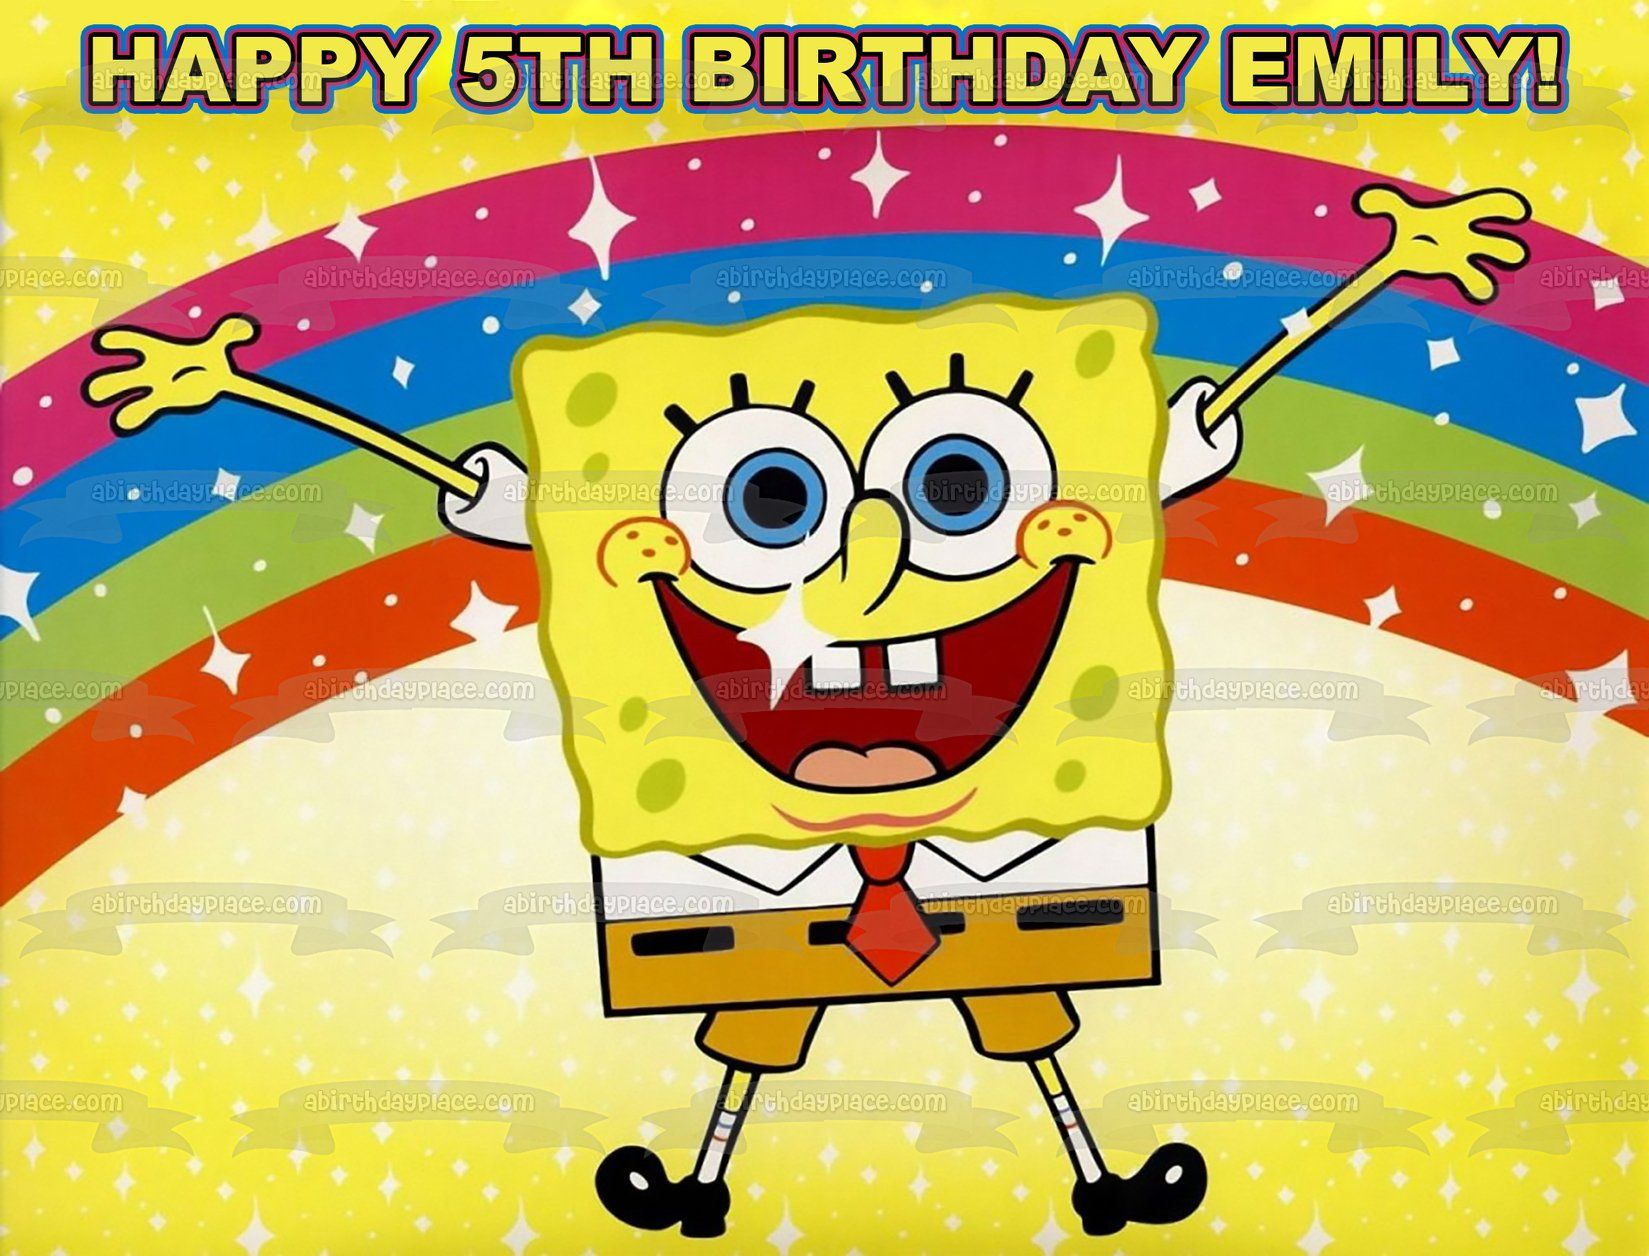 Spongebob Squarepants Jumping Rainbow Yellow Background Edible Cake Topper Image ABPID00386